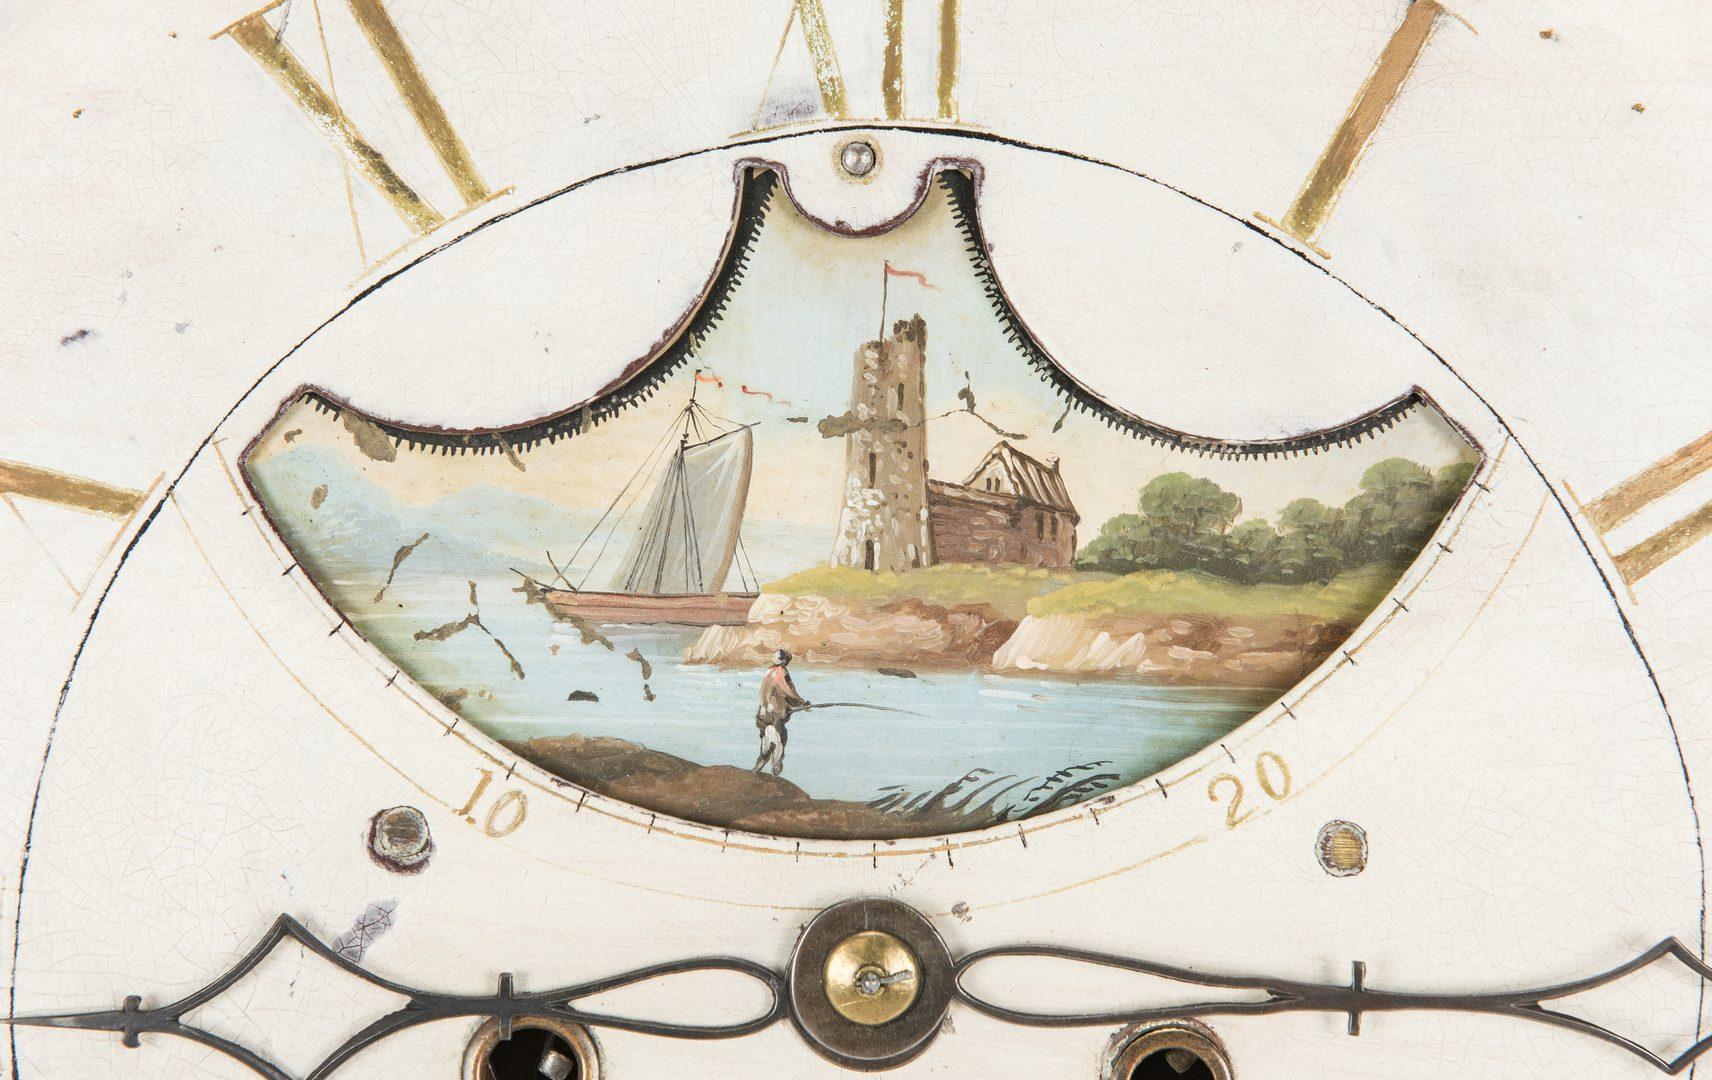 Lot 234: Signed 1801 English Tallcase Clock